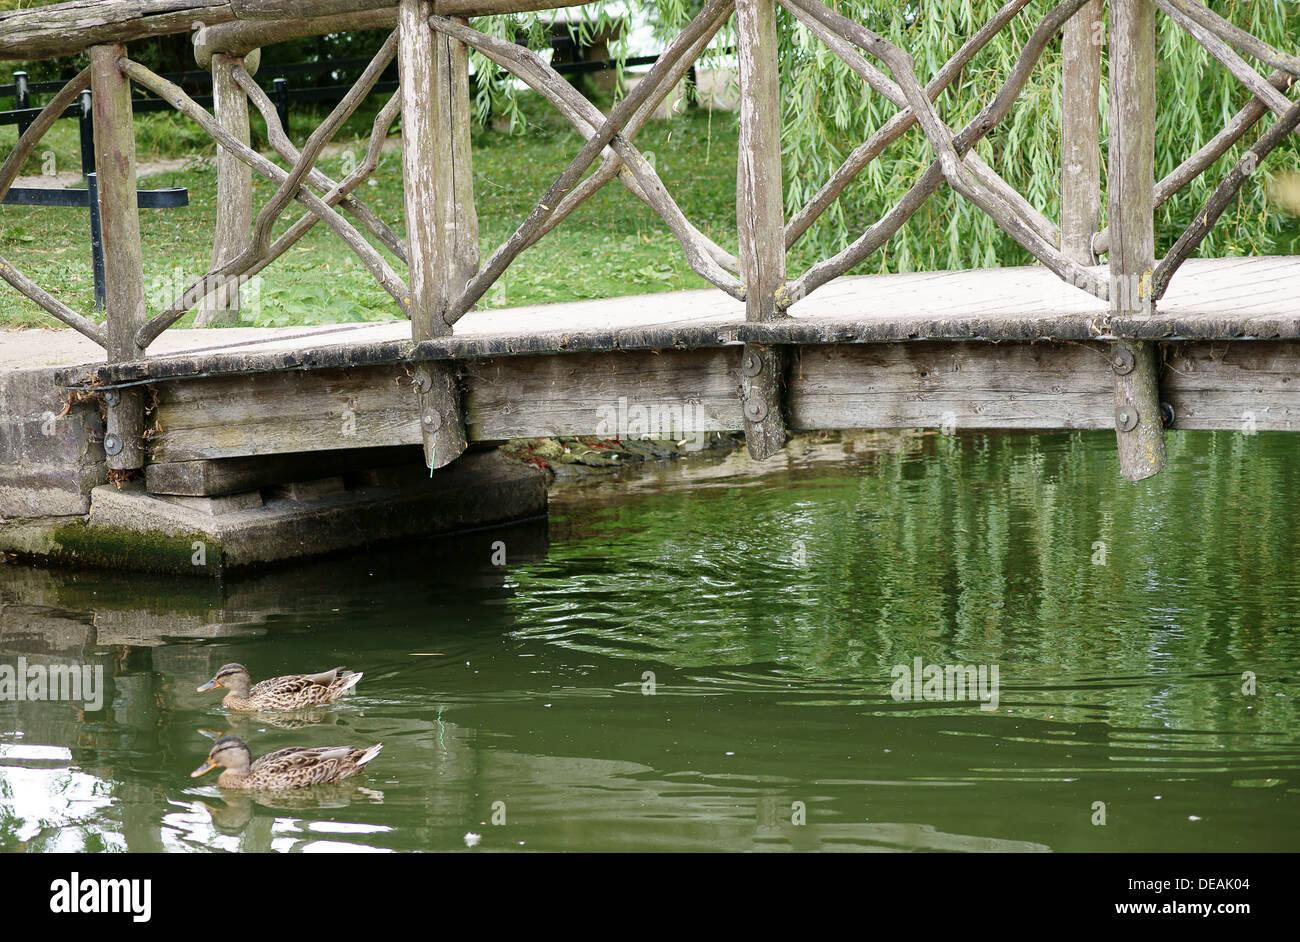 Duck under the wooden bridge Stock Photo